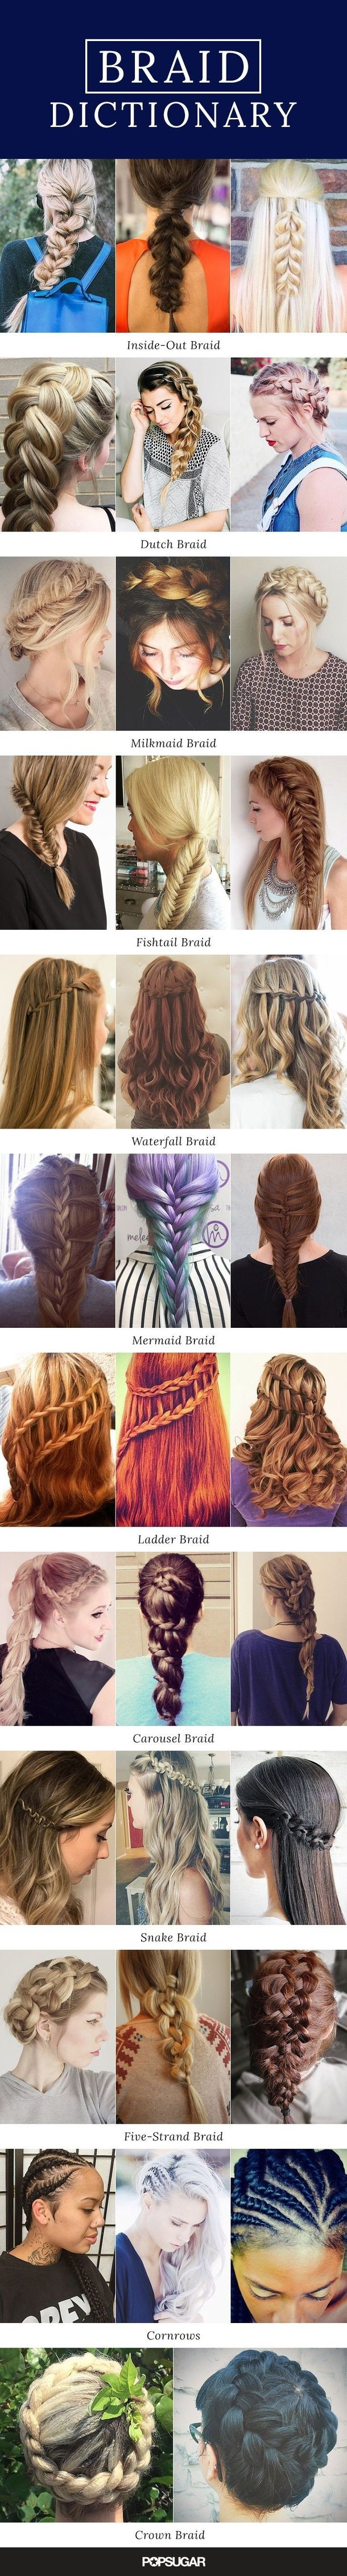 125 Beautiful Hair Braids For You To Try hair braid long hair braids hair ideas braided hair hairstyles short hair medium hair diy braids